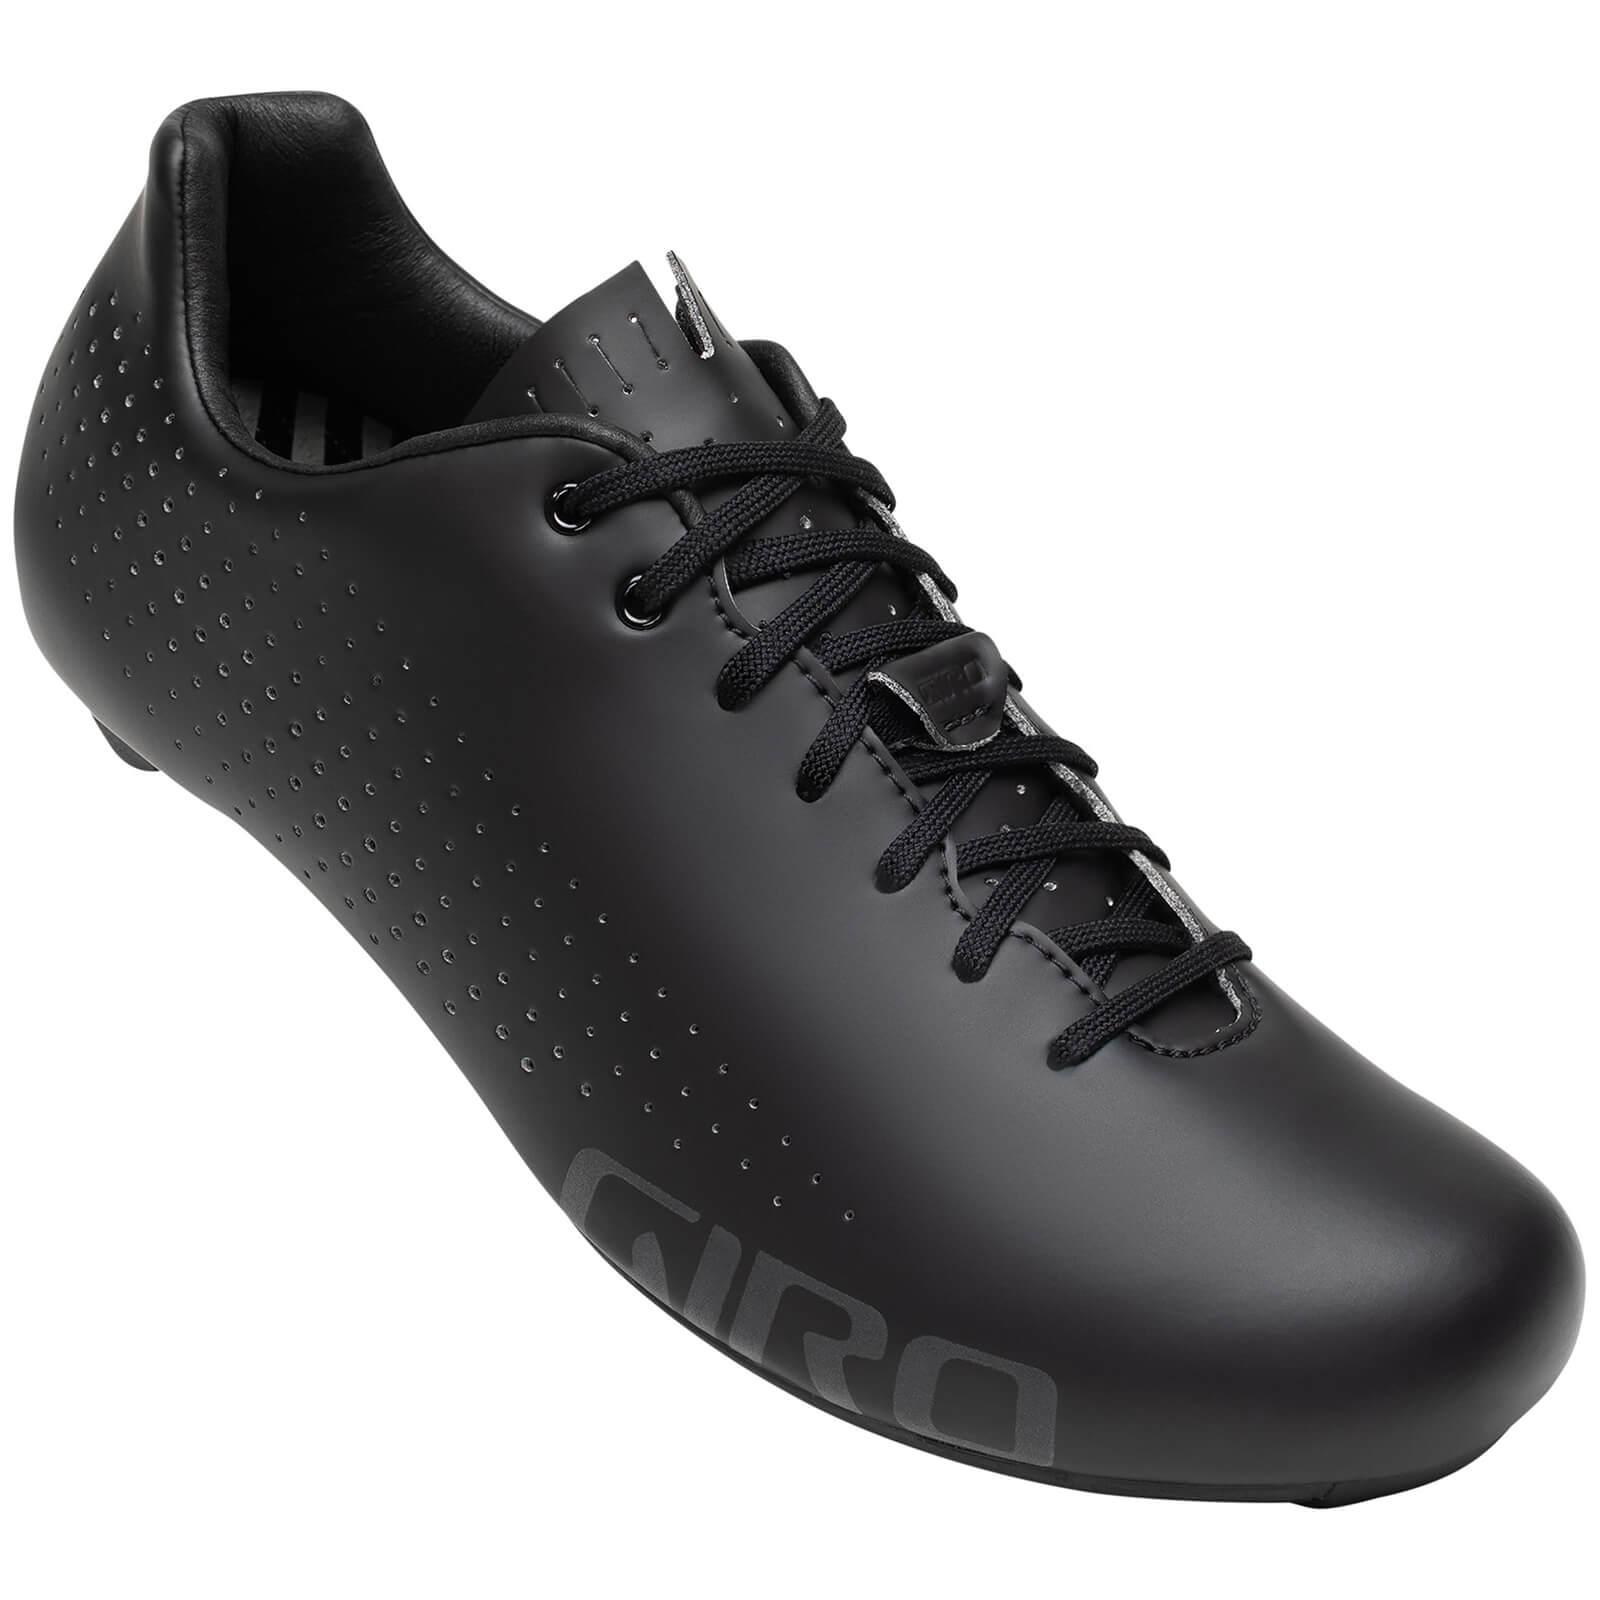 Giro Empire Road Shoe - EU 40 - Schwarz